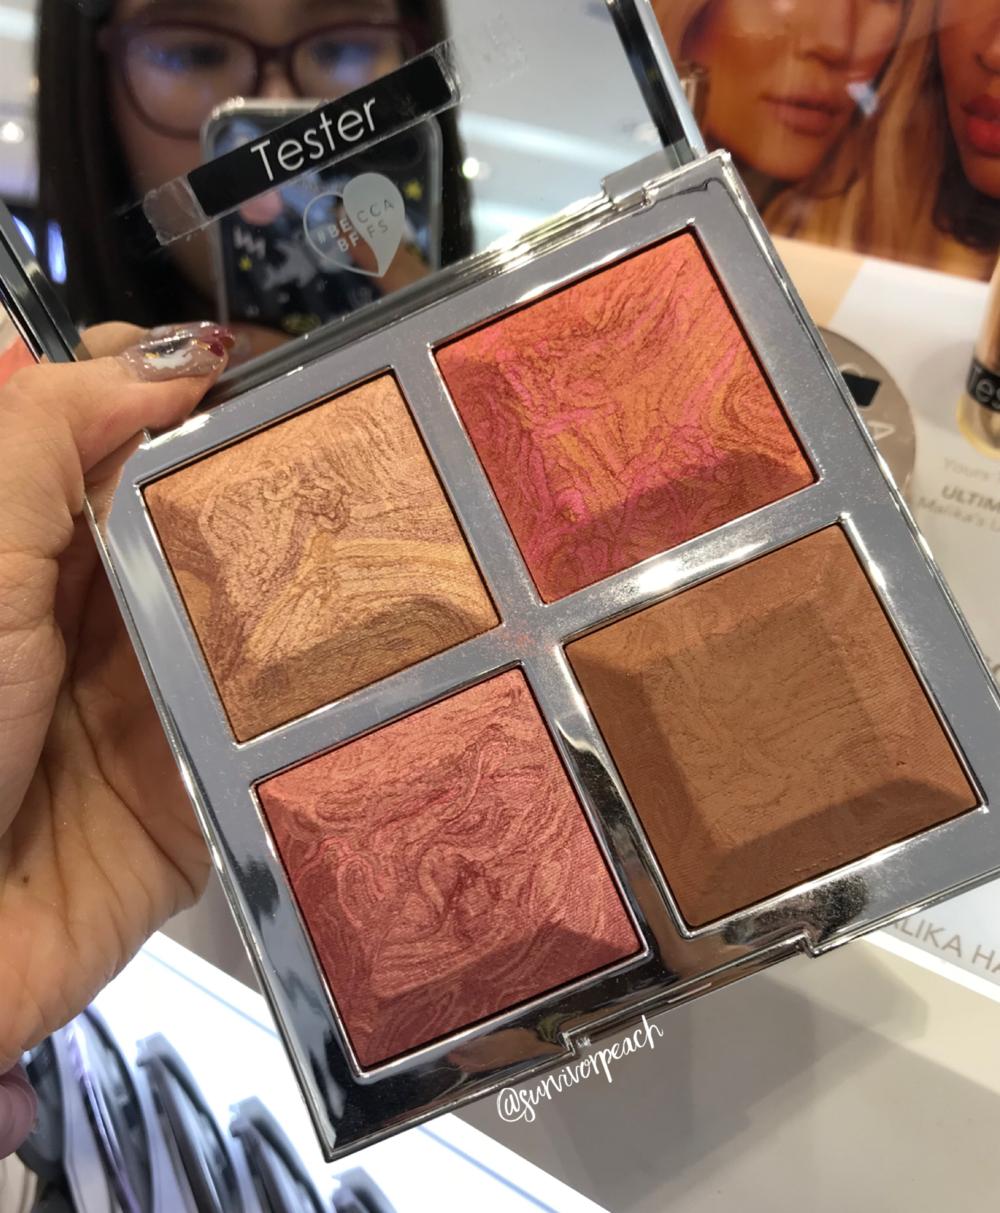 BECCA x Khloé Kardashian & Malika Haqq Bronze, Blush & Glow Palette in  Made With Love By Malika